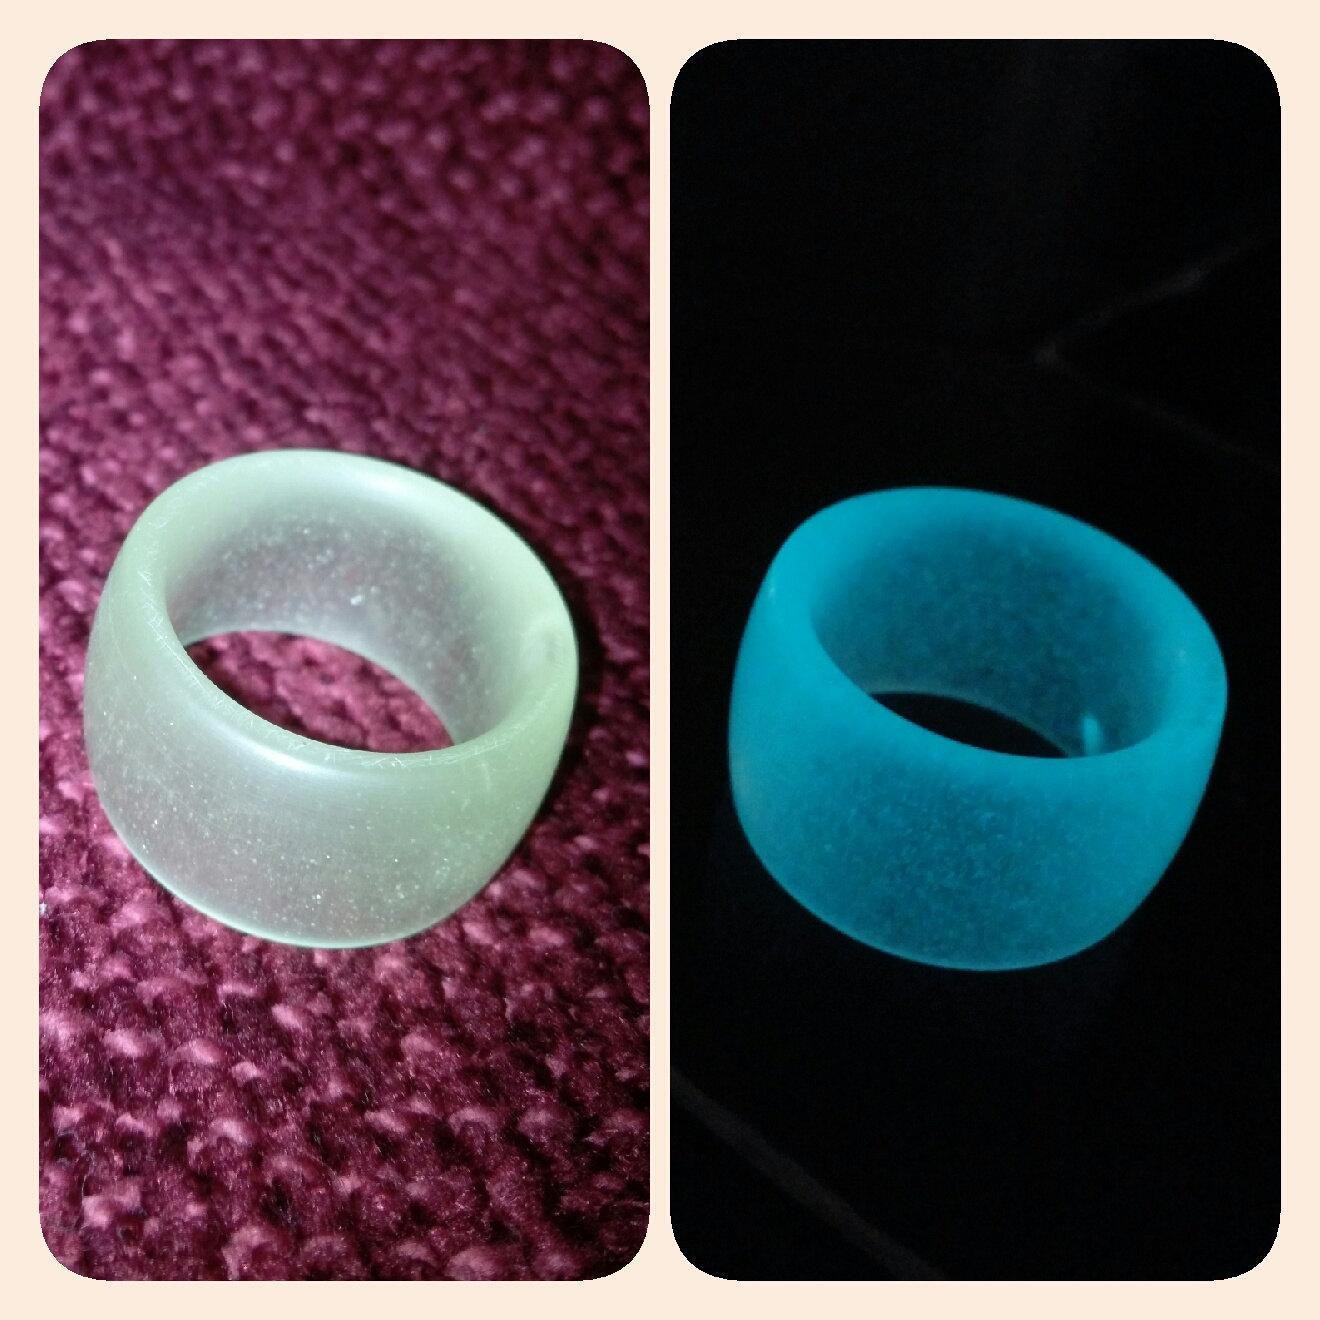 Glow in the dark resin ring aqua by rasconartdesigns on etsy for Glow in the dark resin